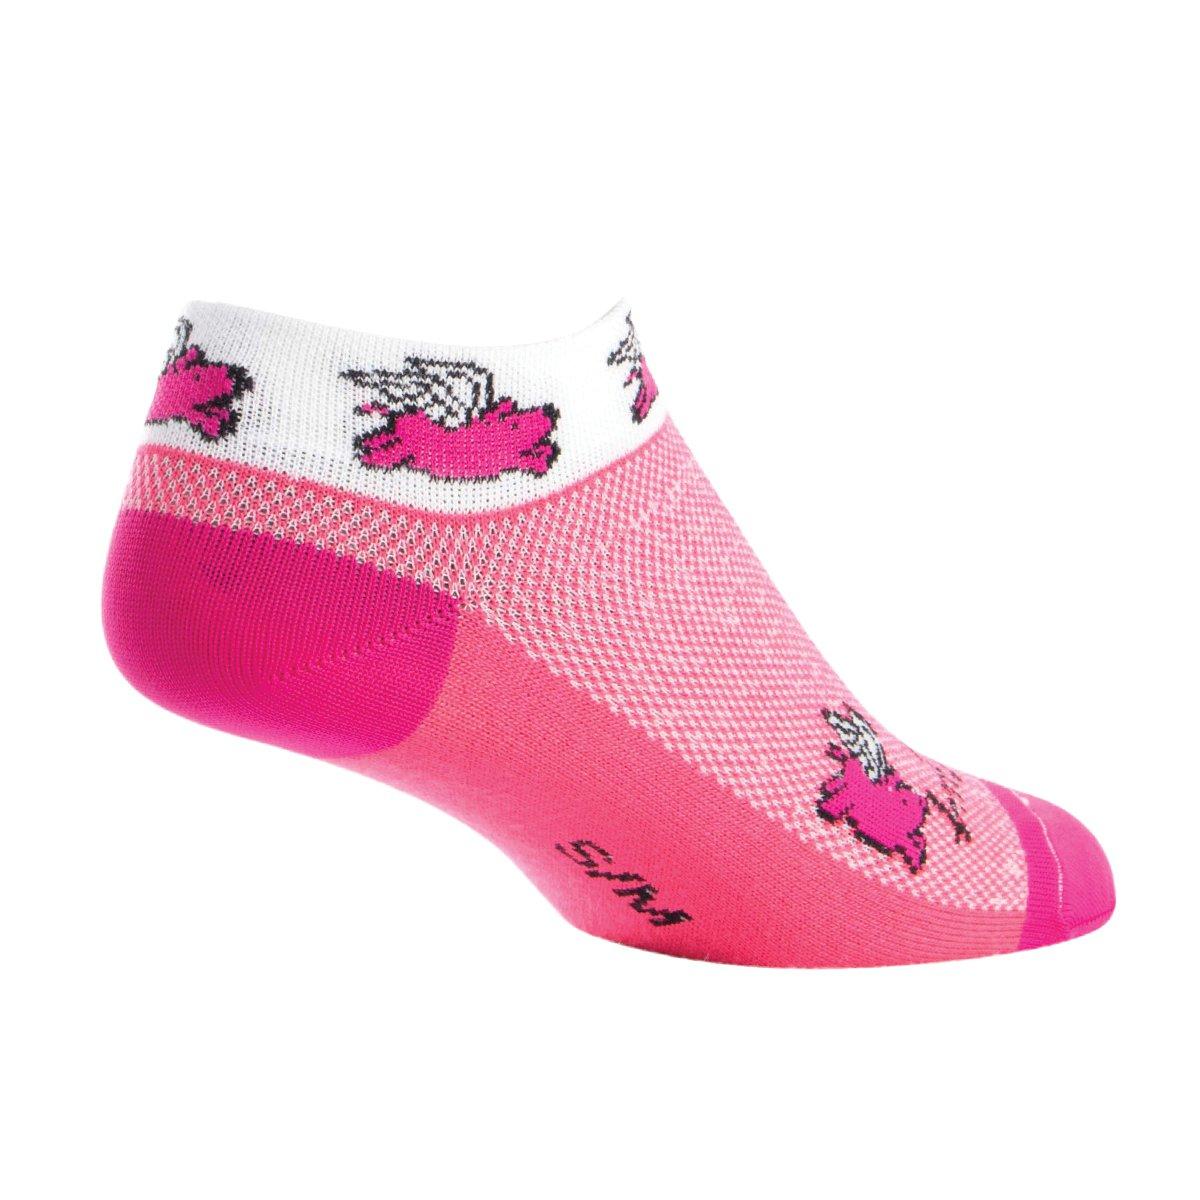 Sockguy Women's Low Cut Socks Small/Medium SGLCFLY